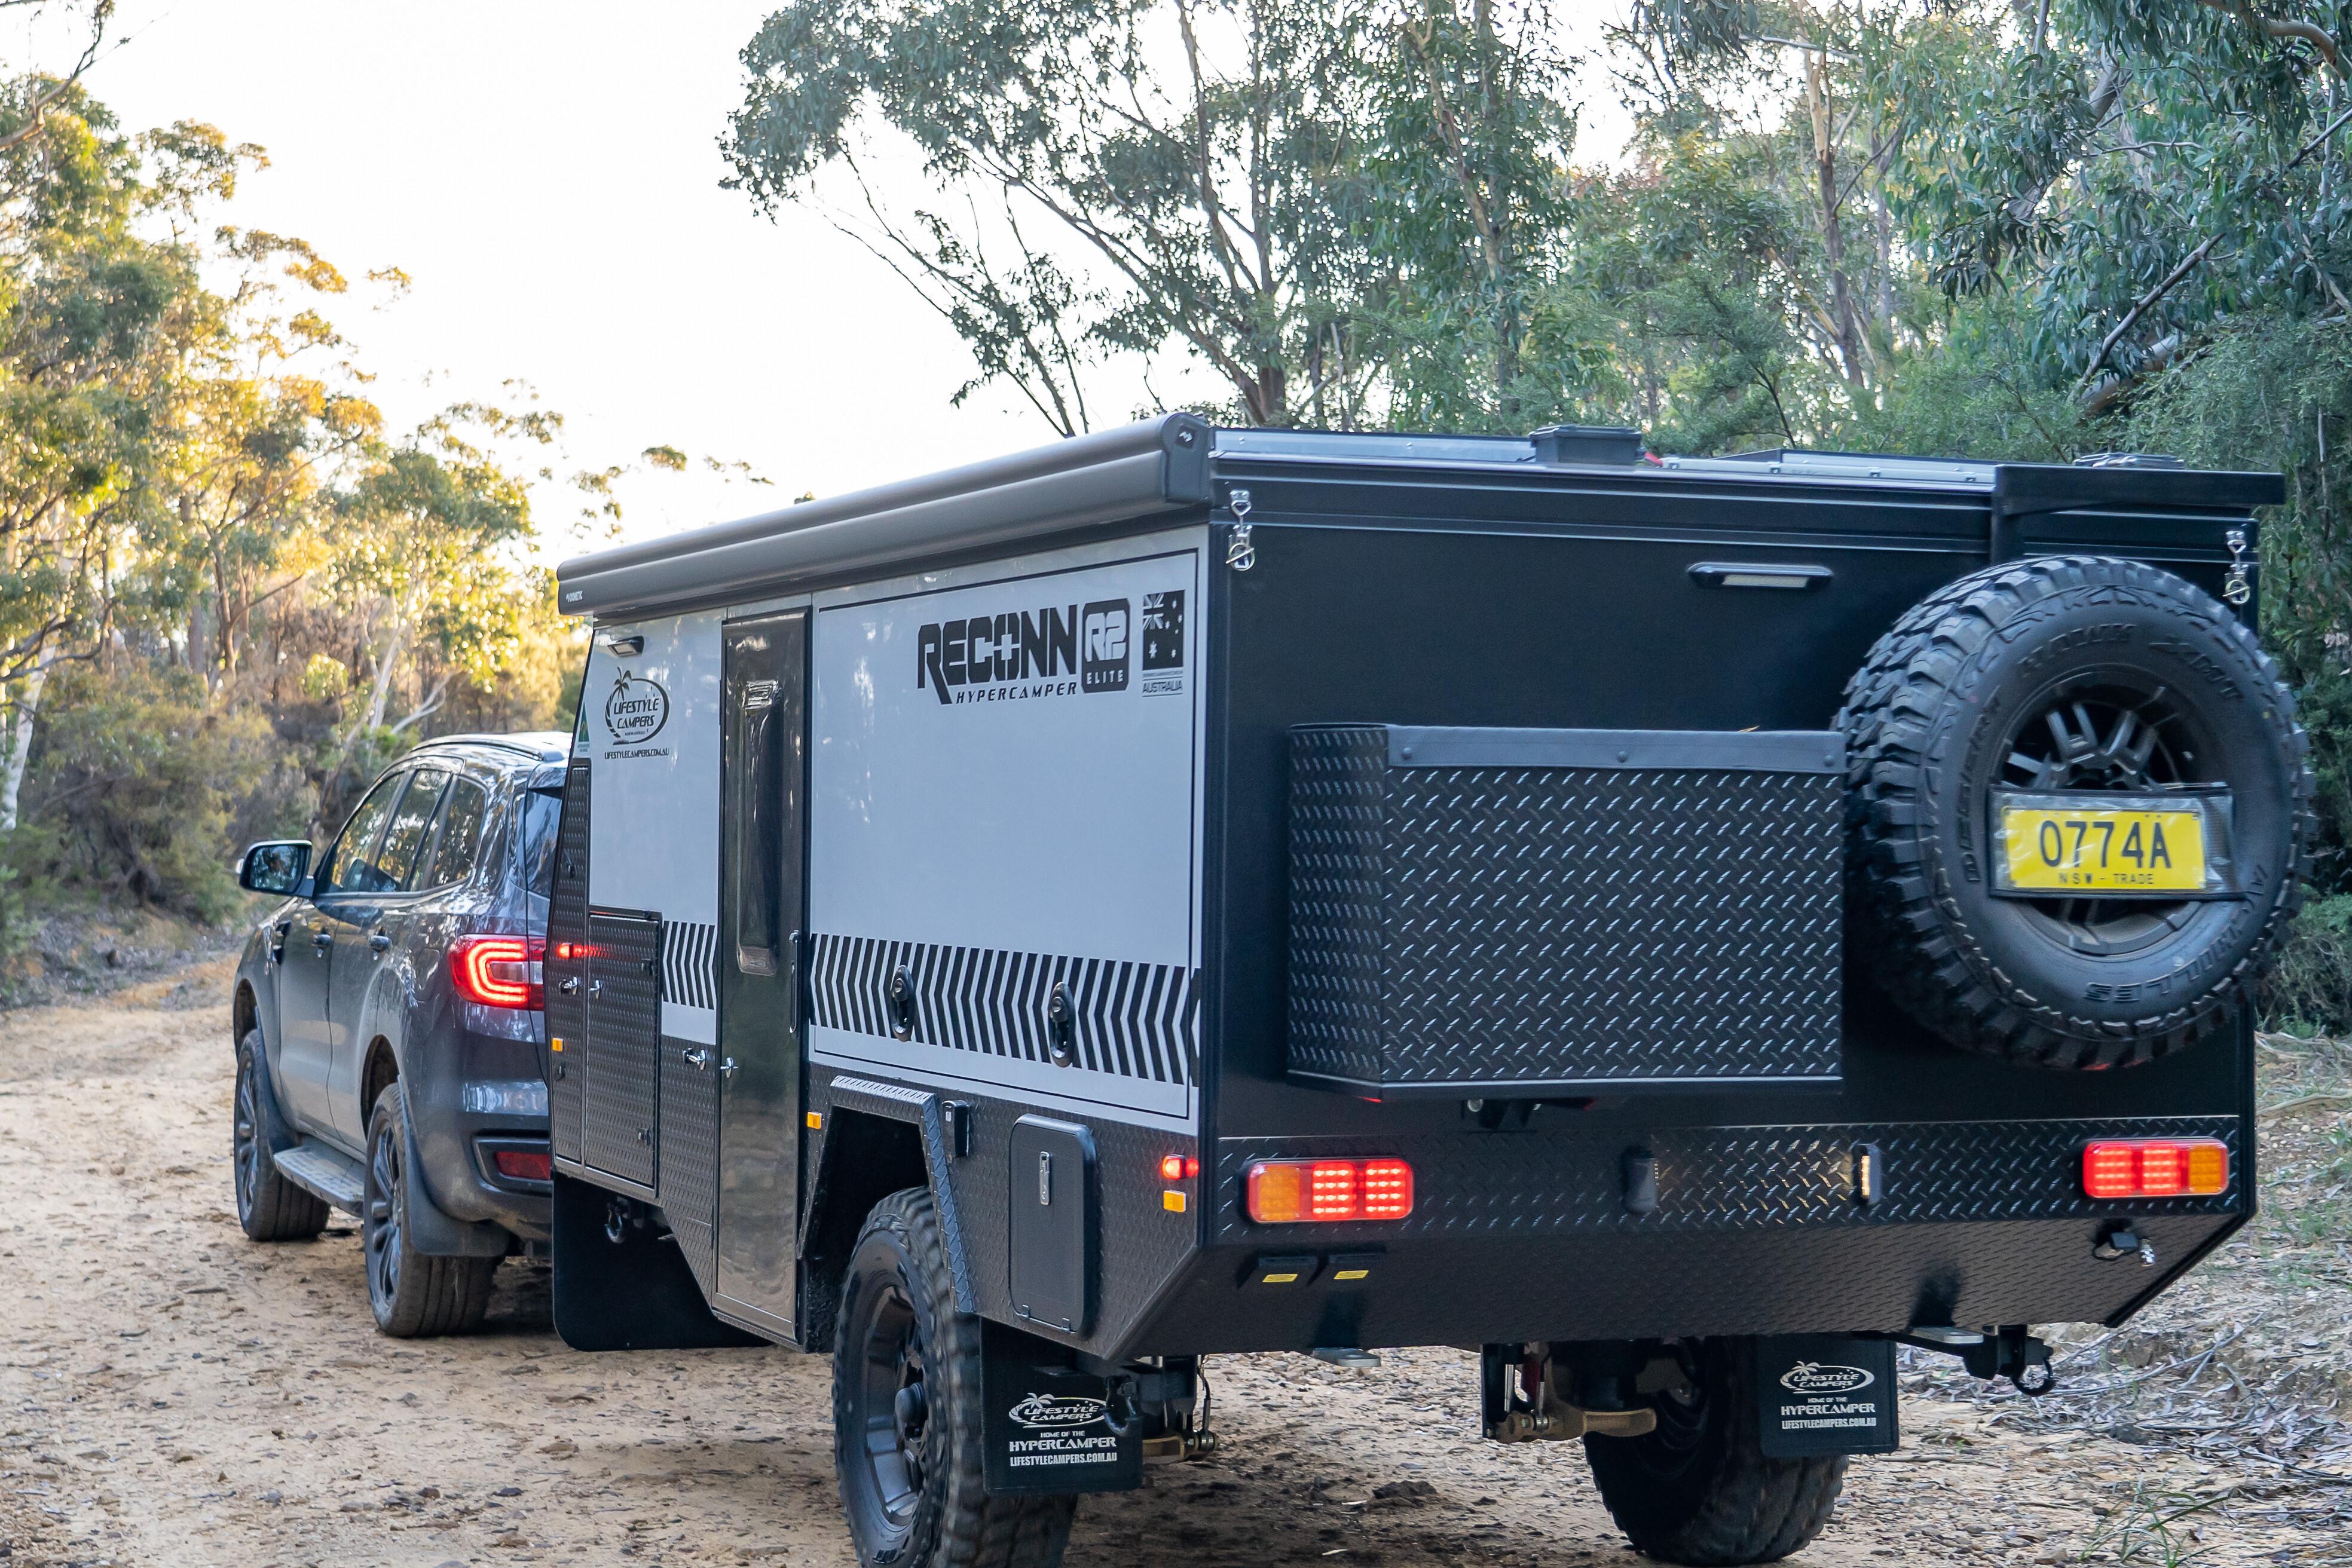 4 X 4 Australia Gear Lifestyle Reconn 2 Camper 7